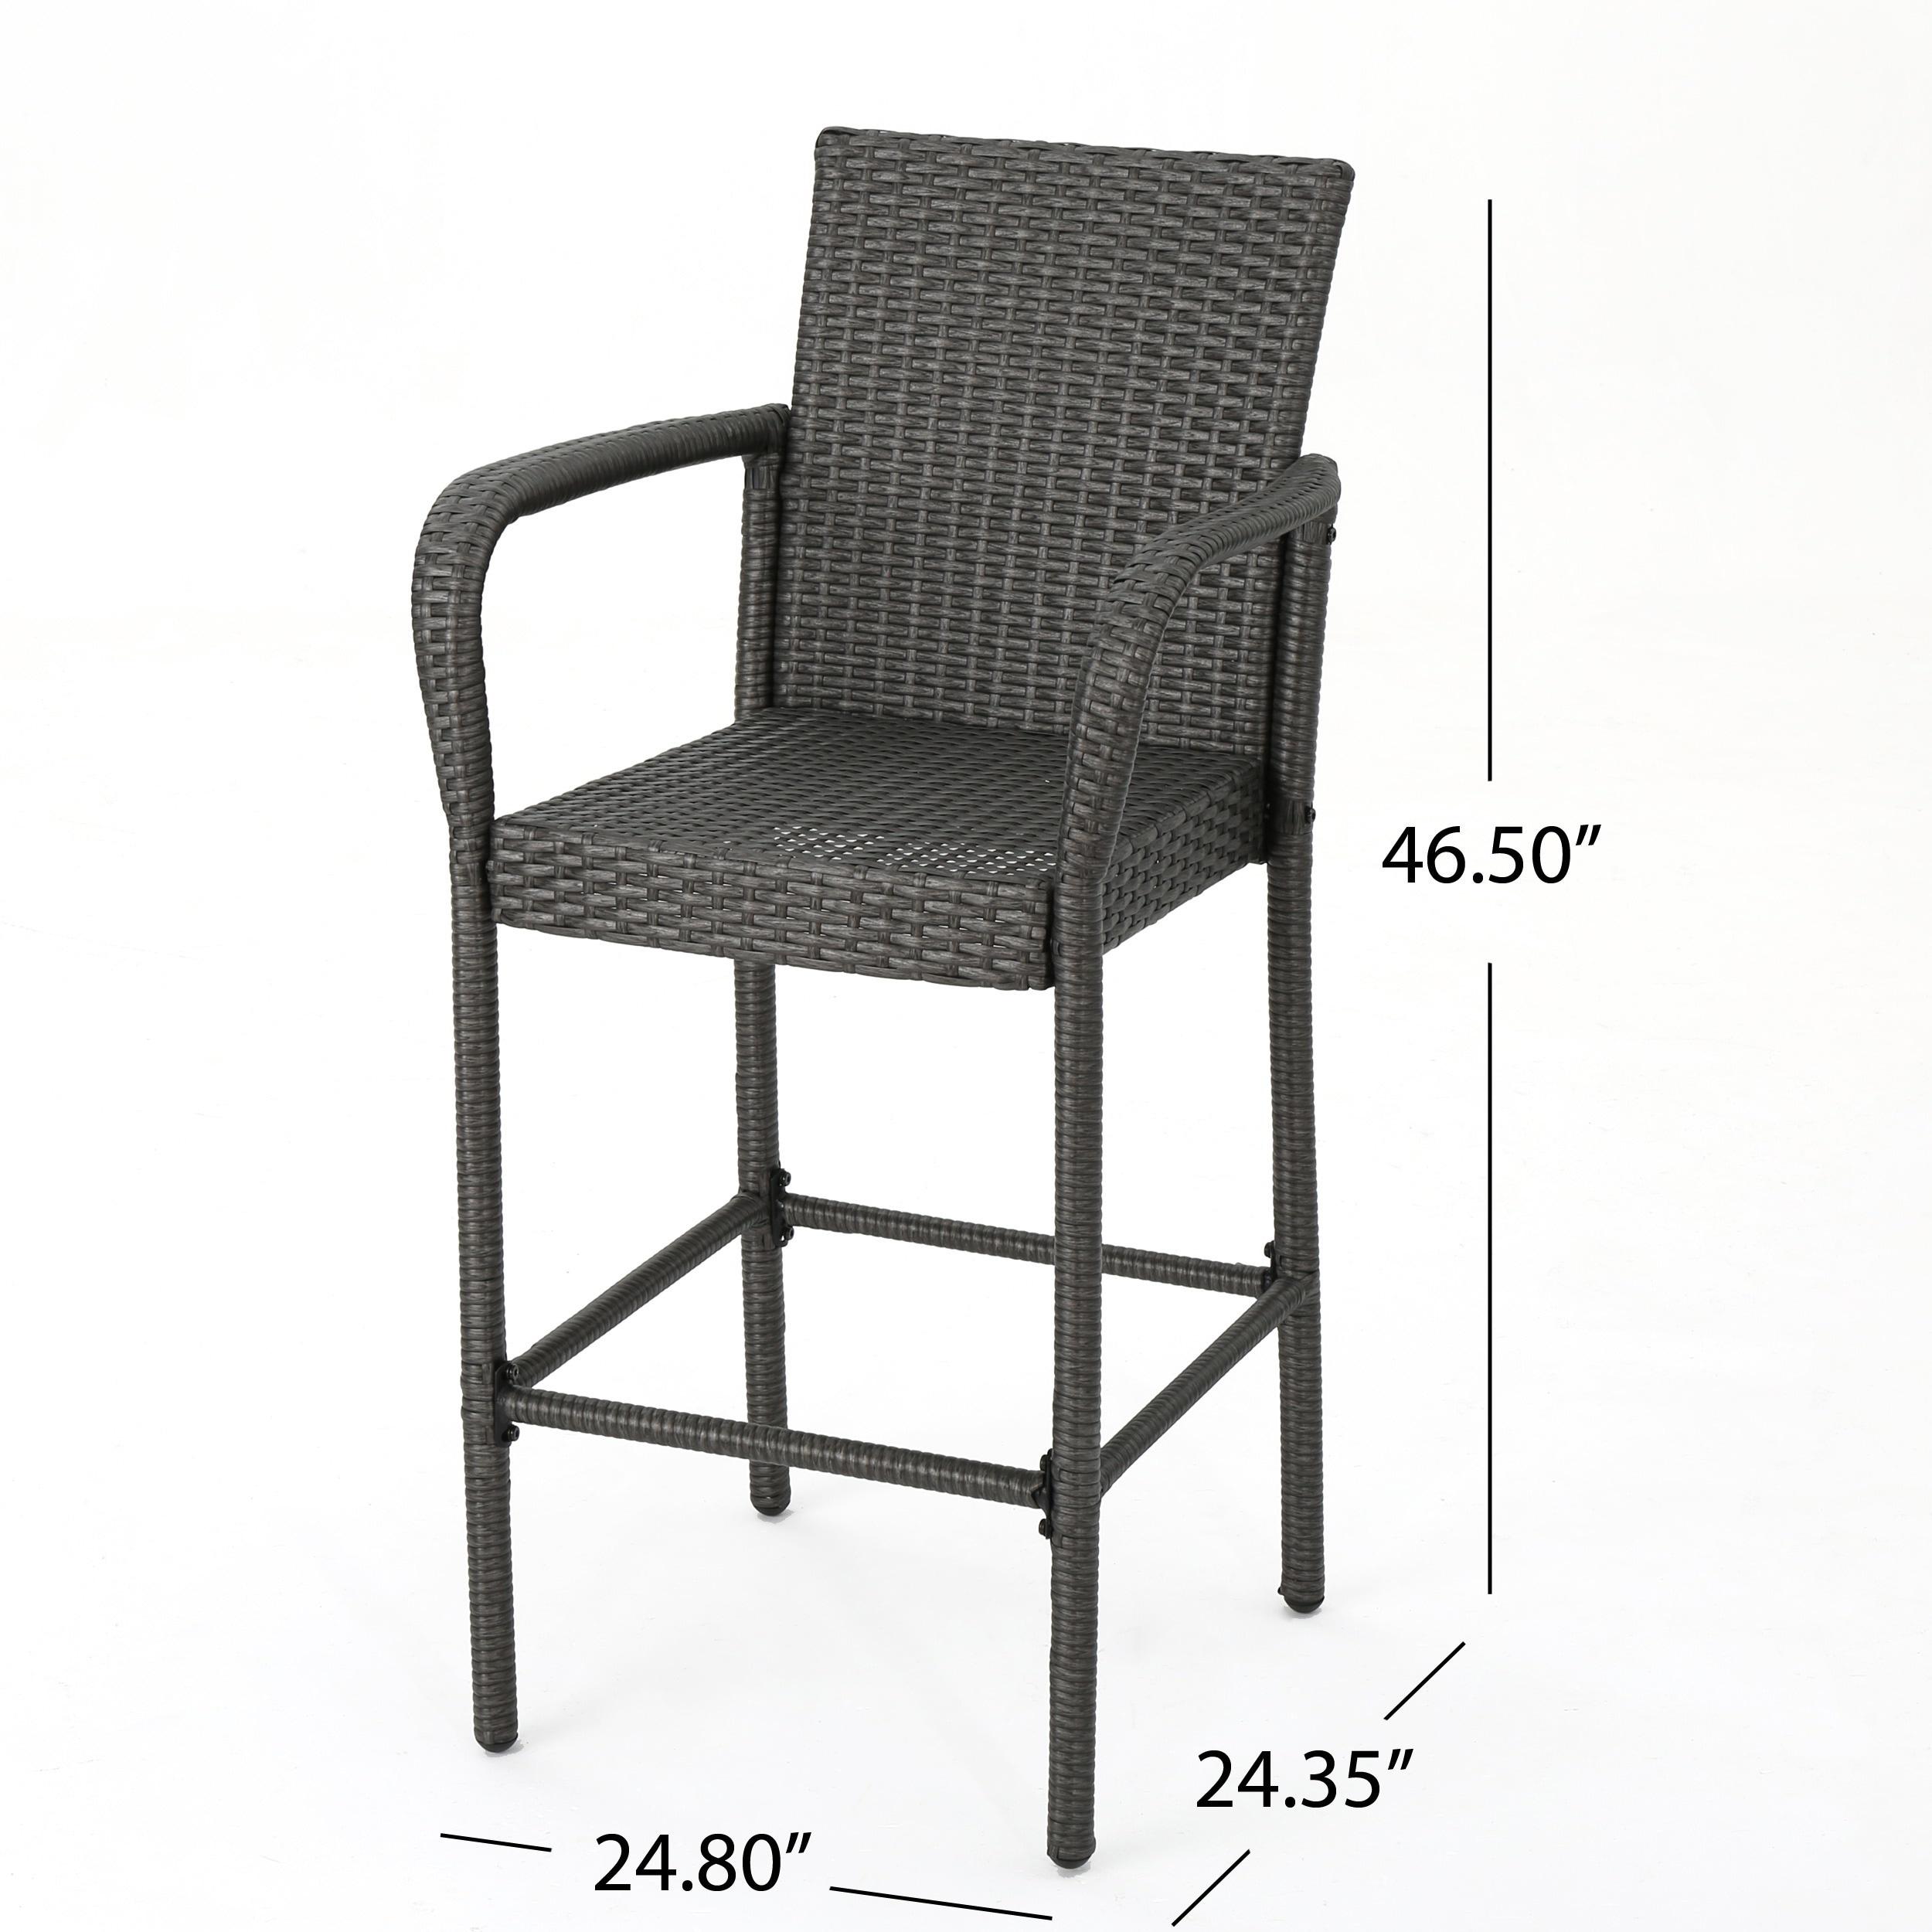 Terrific Delfina Outdoor Wicker Barstool Set Of 4 By Christopher Knight Home Machost Co Dining Chair Design Ideas Machostcouk